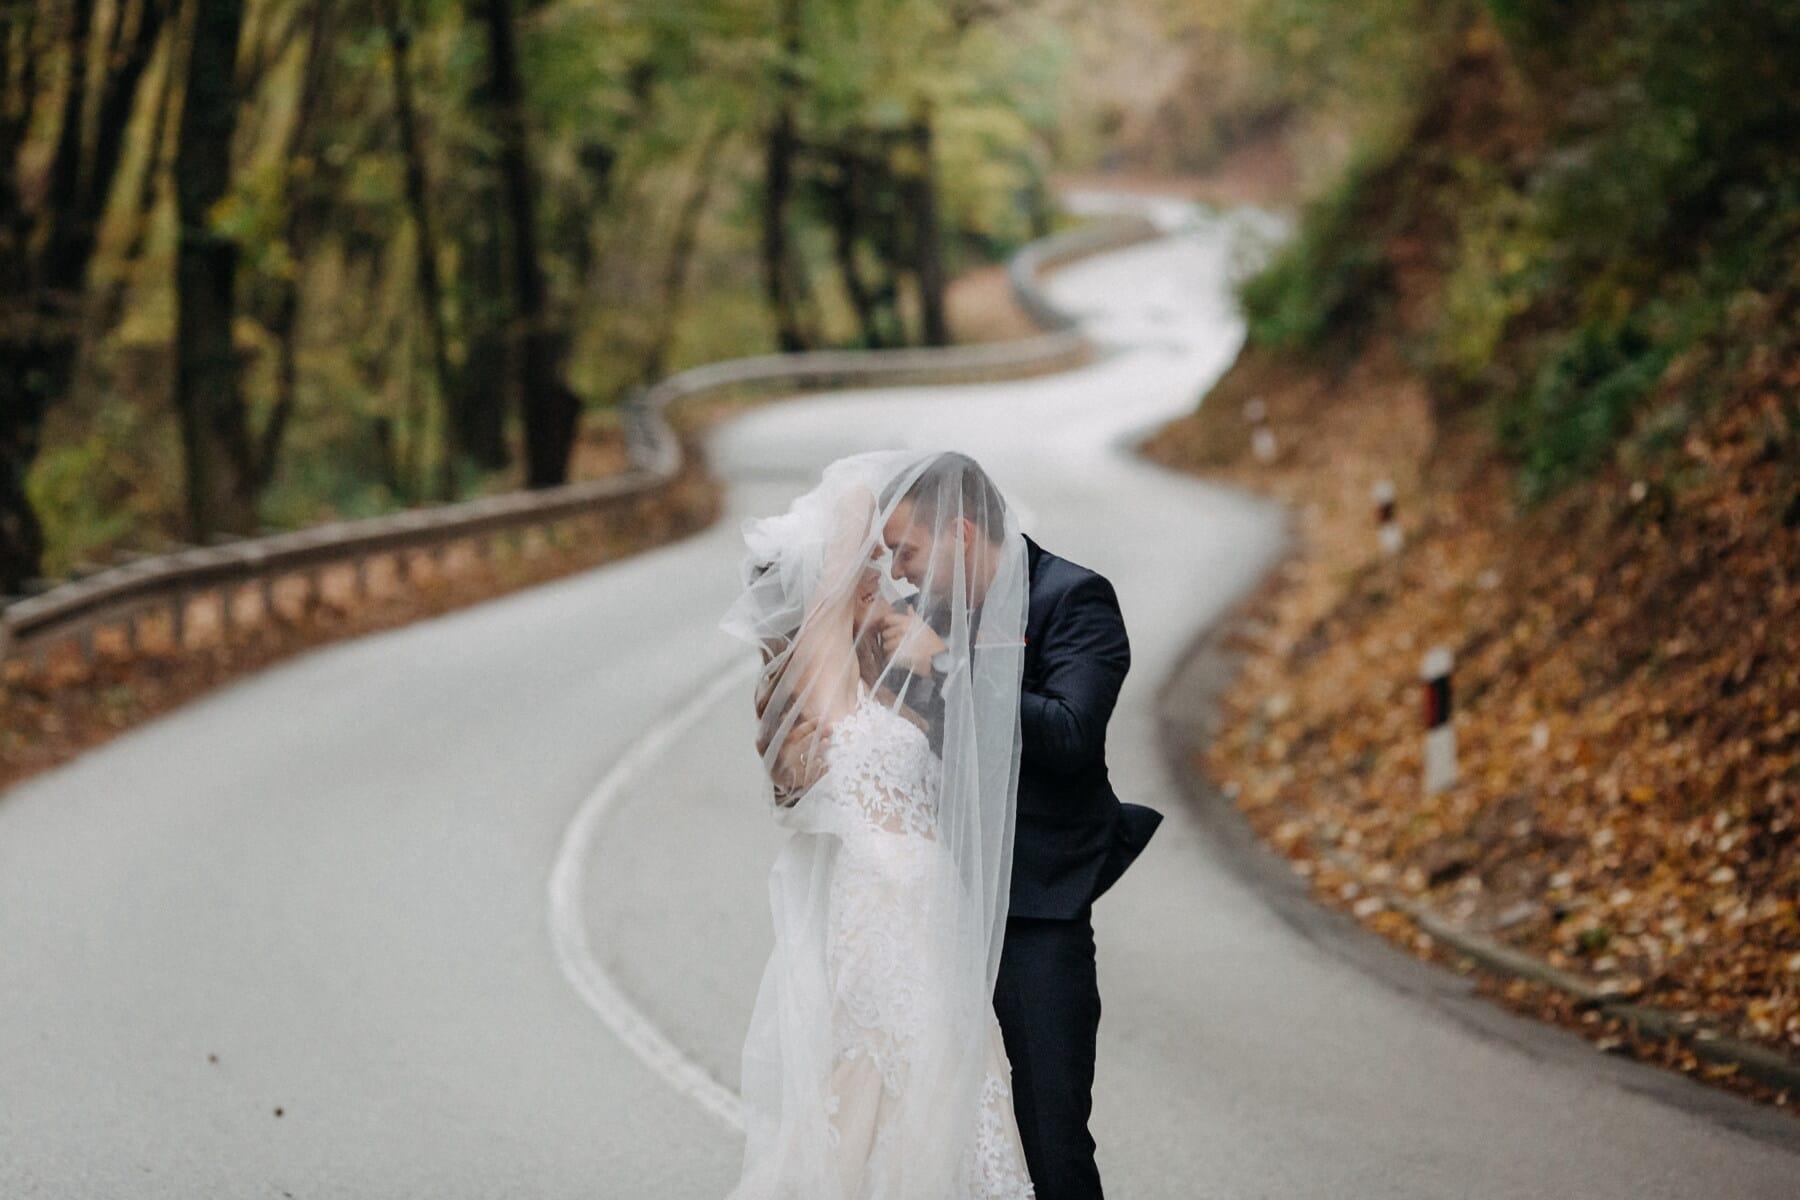 asphalt, newlyweds, forest road, wedding, bride, road, street, blur, nature, outdoors